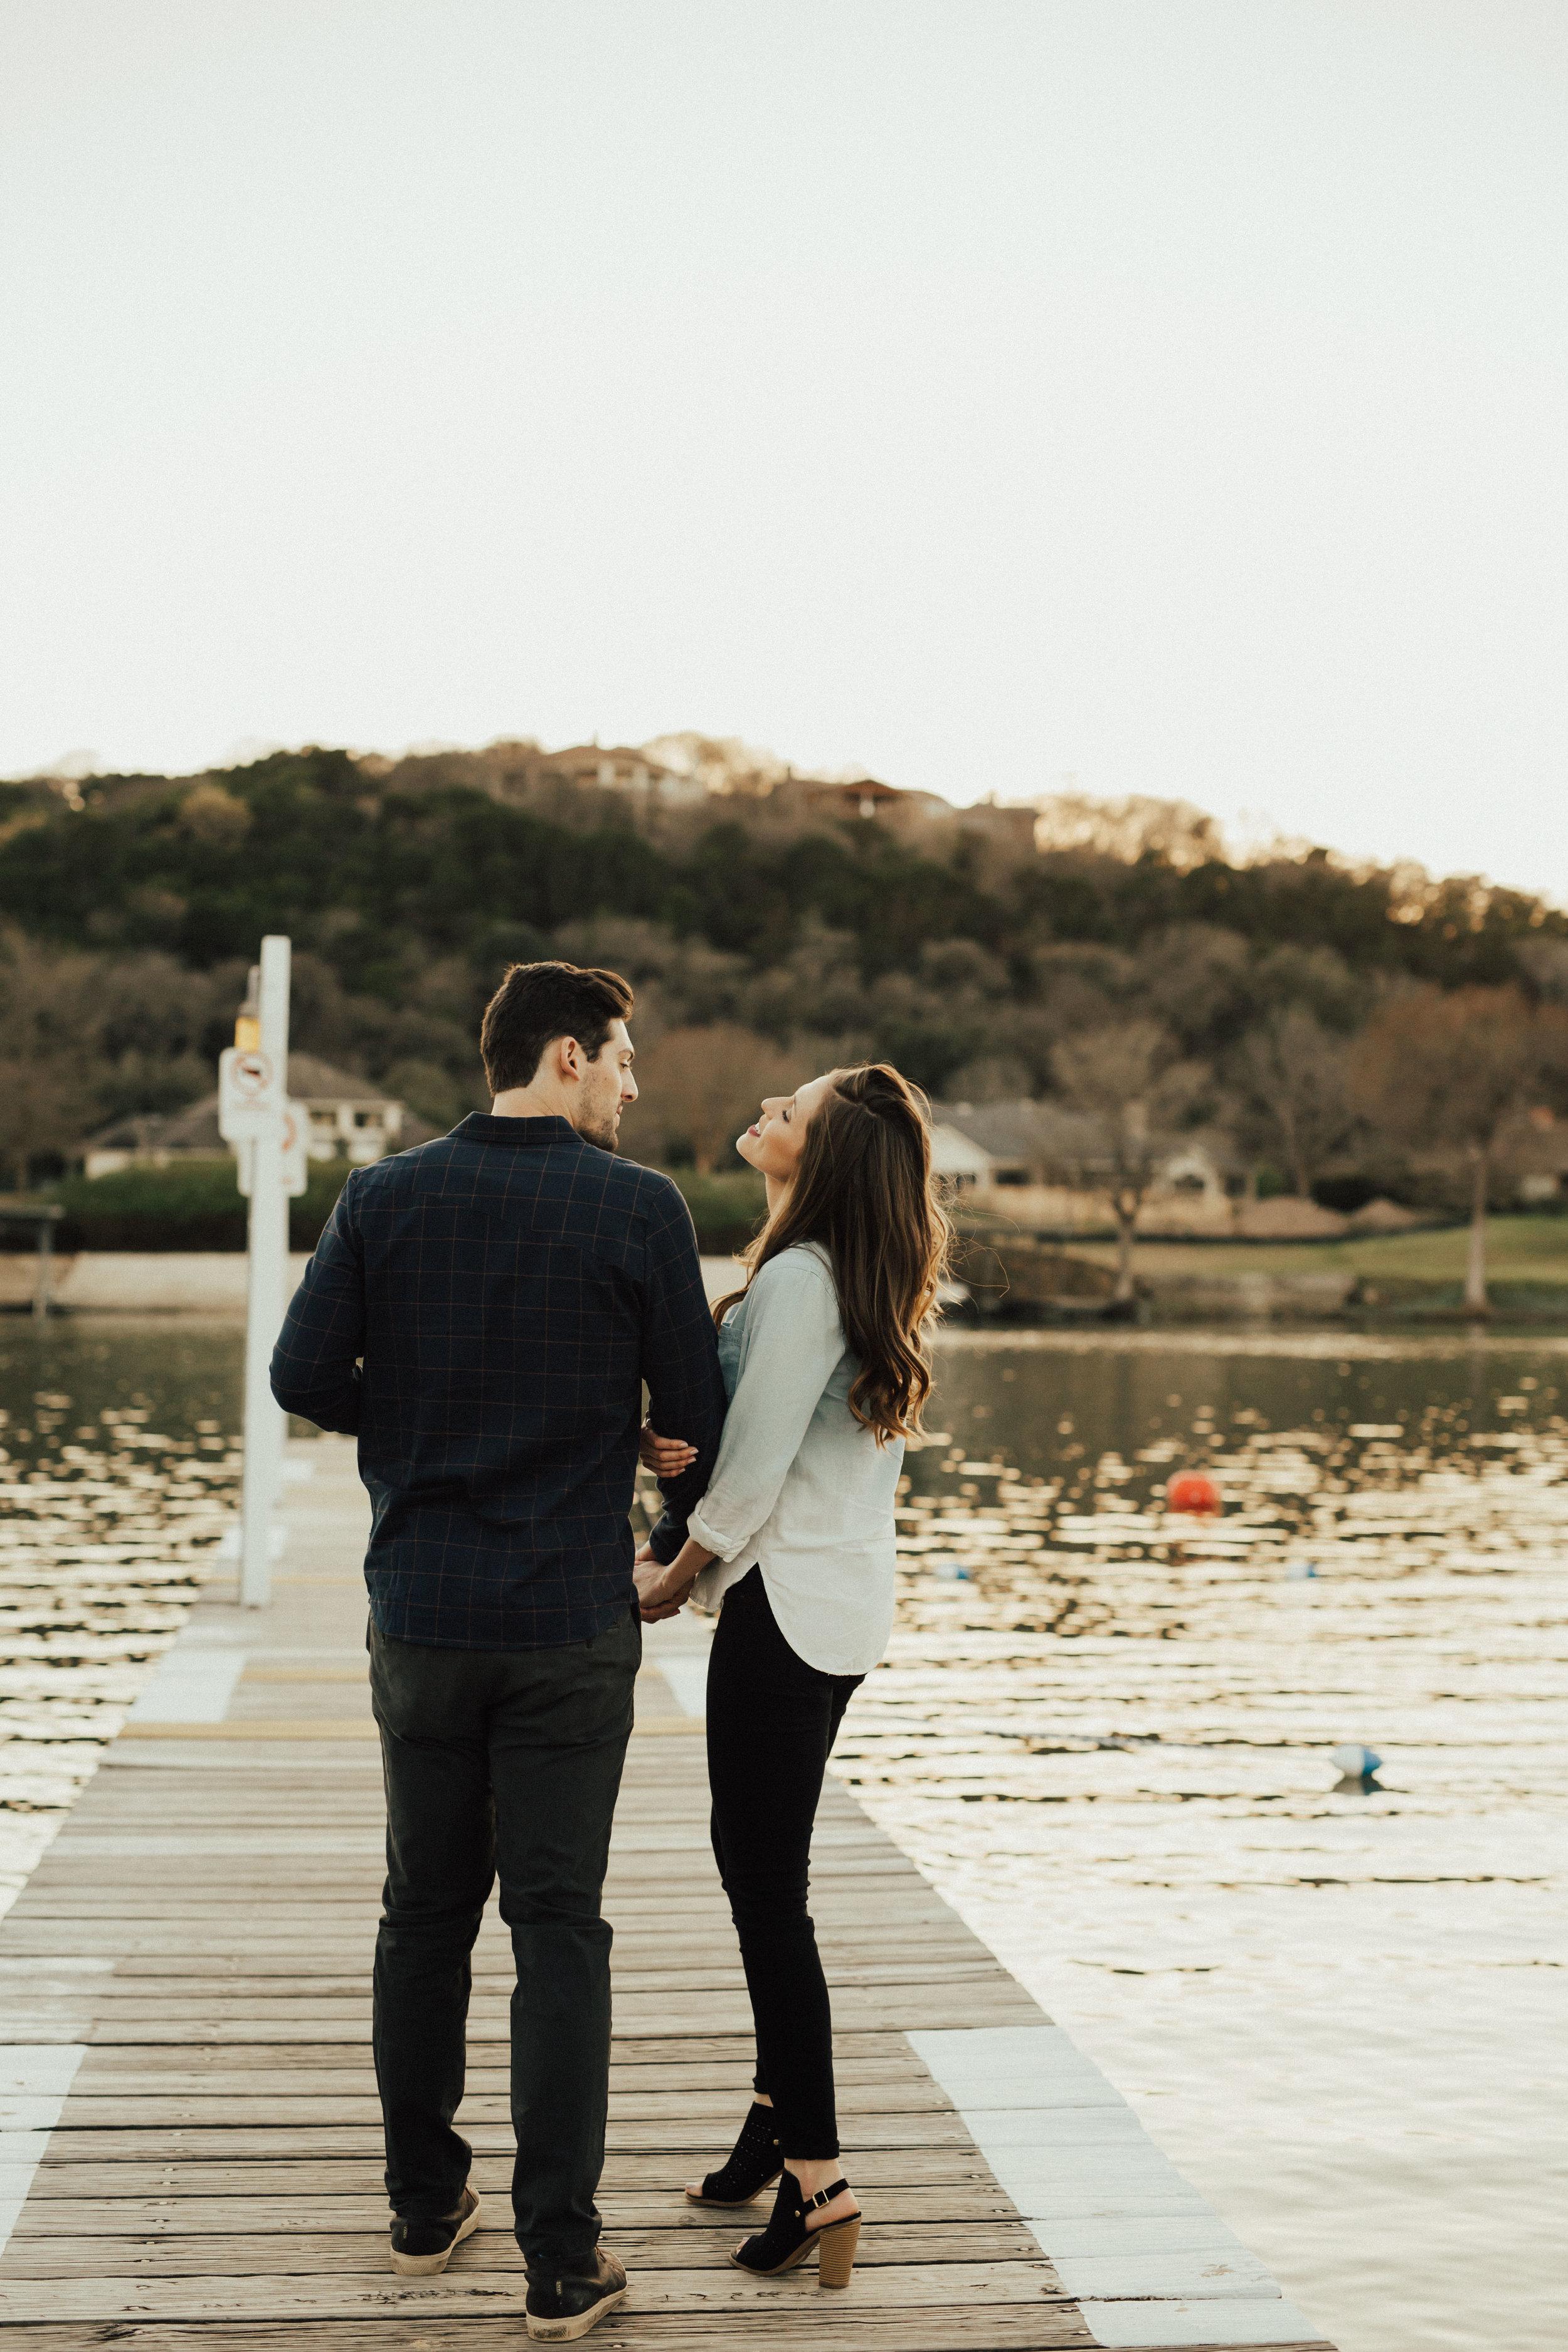 Morgan -Christian-Engagements-Austin-texas-skyline-Emma-Long-Metropolitan-Park-texas-photographer-29